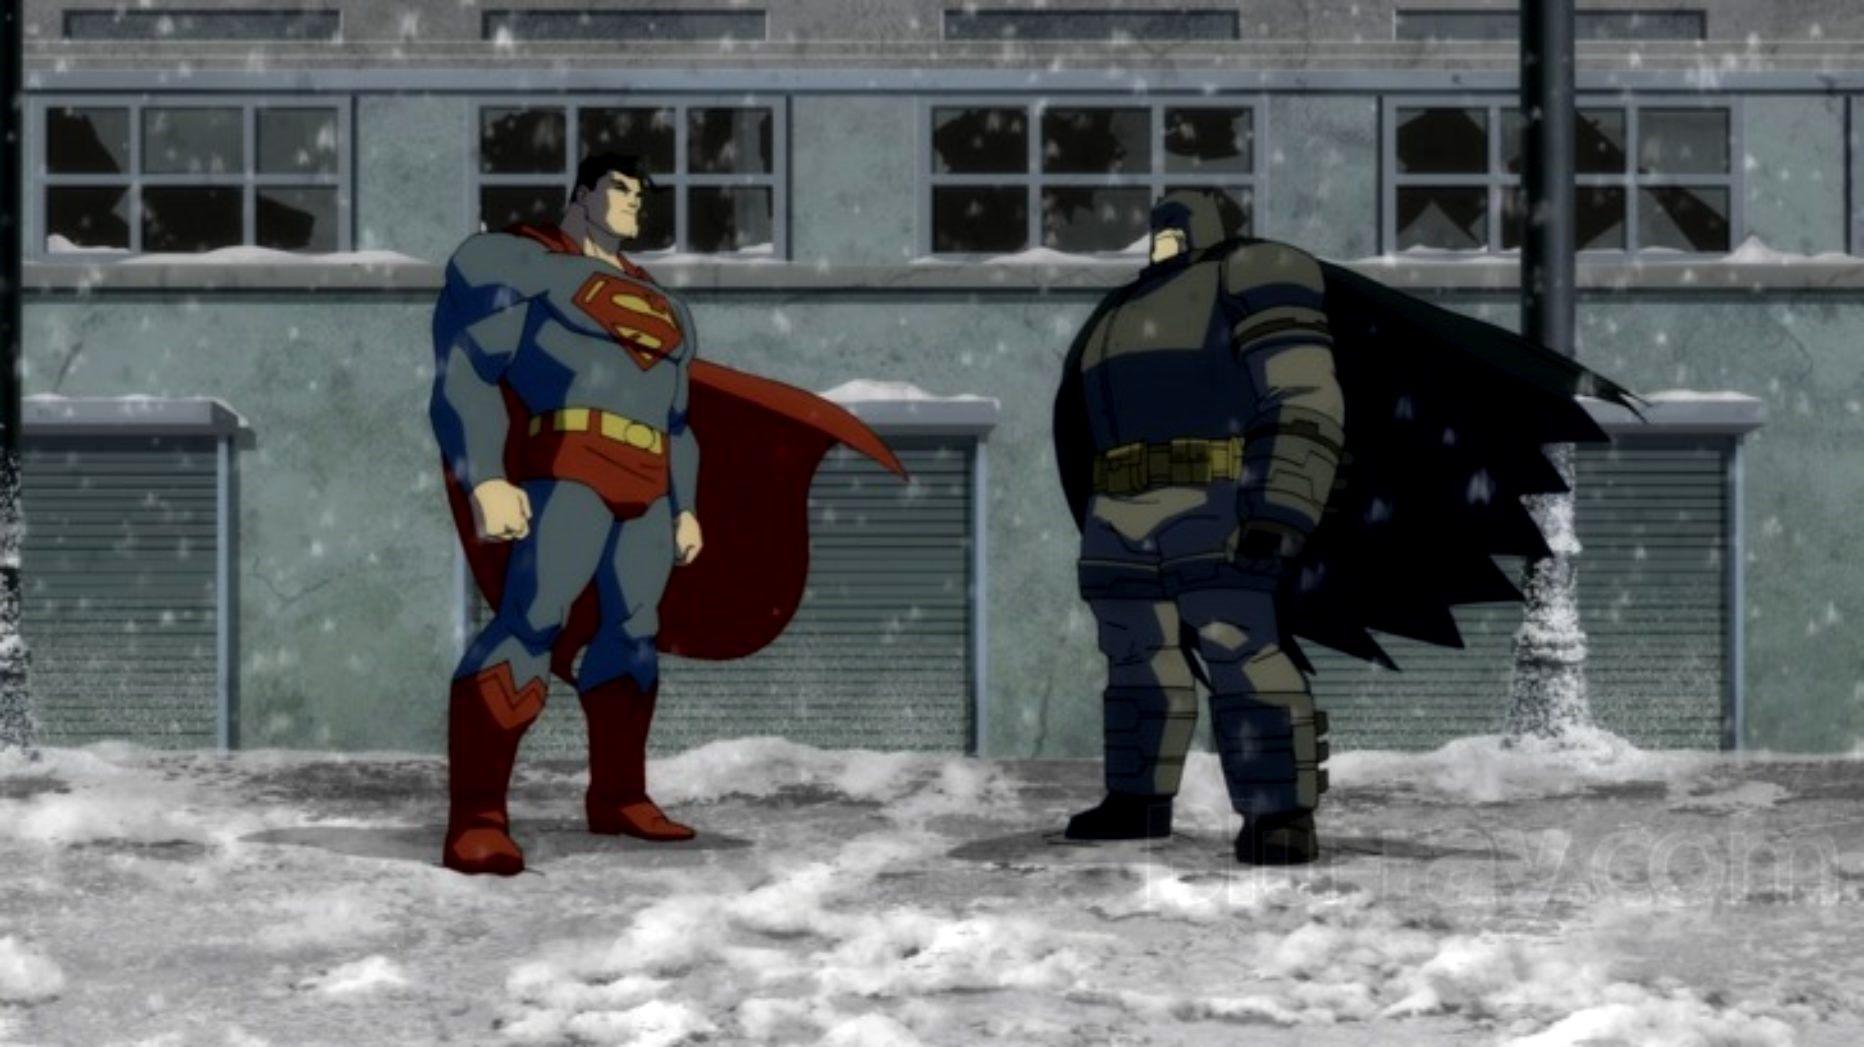 Showdown between Superman and Batman in Batman The Dark Knight Returns Part II (2013)